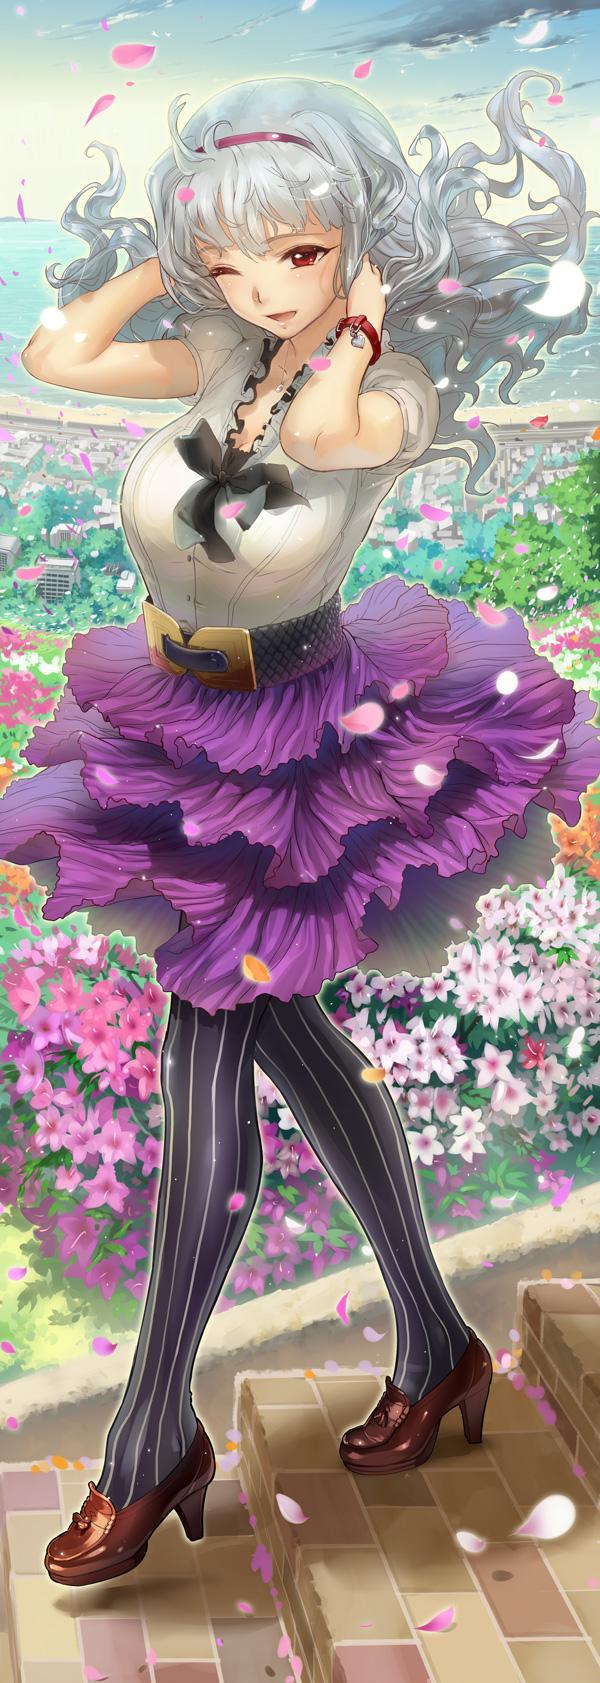 Tags: Anime, Andou Chikanori, THE iDOLM@STER, Shijou Takane